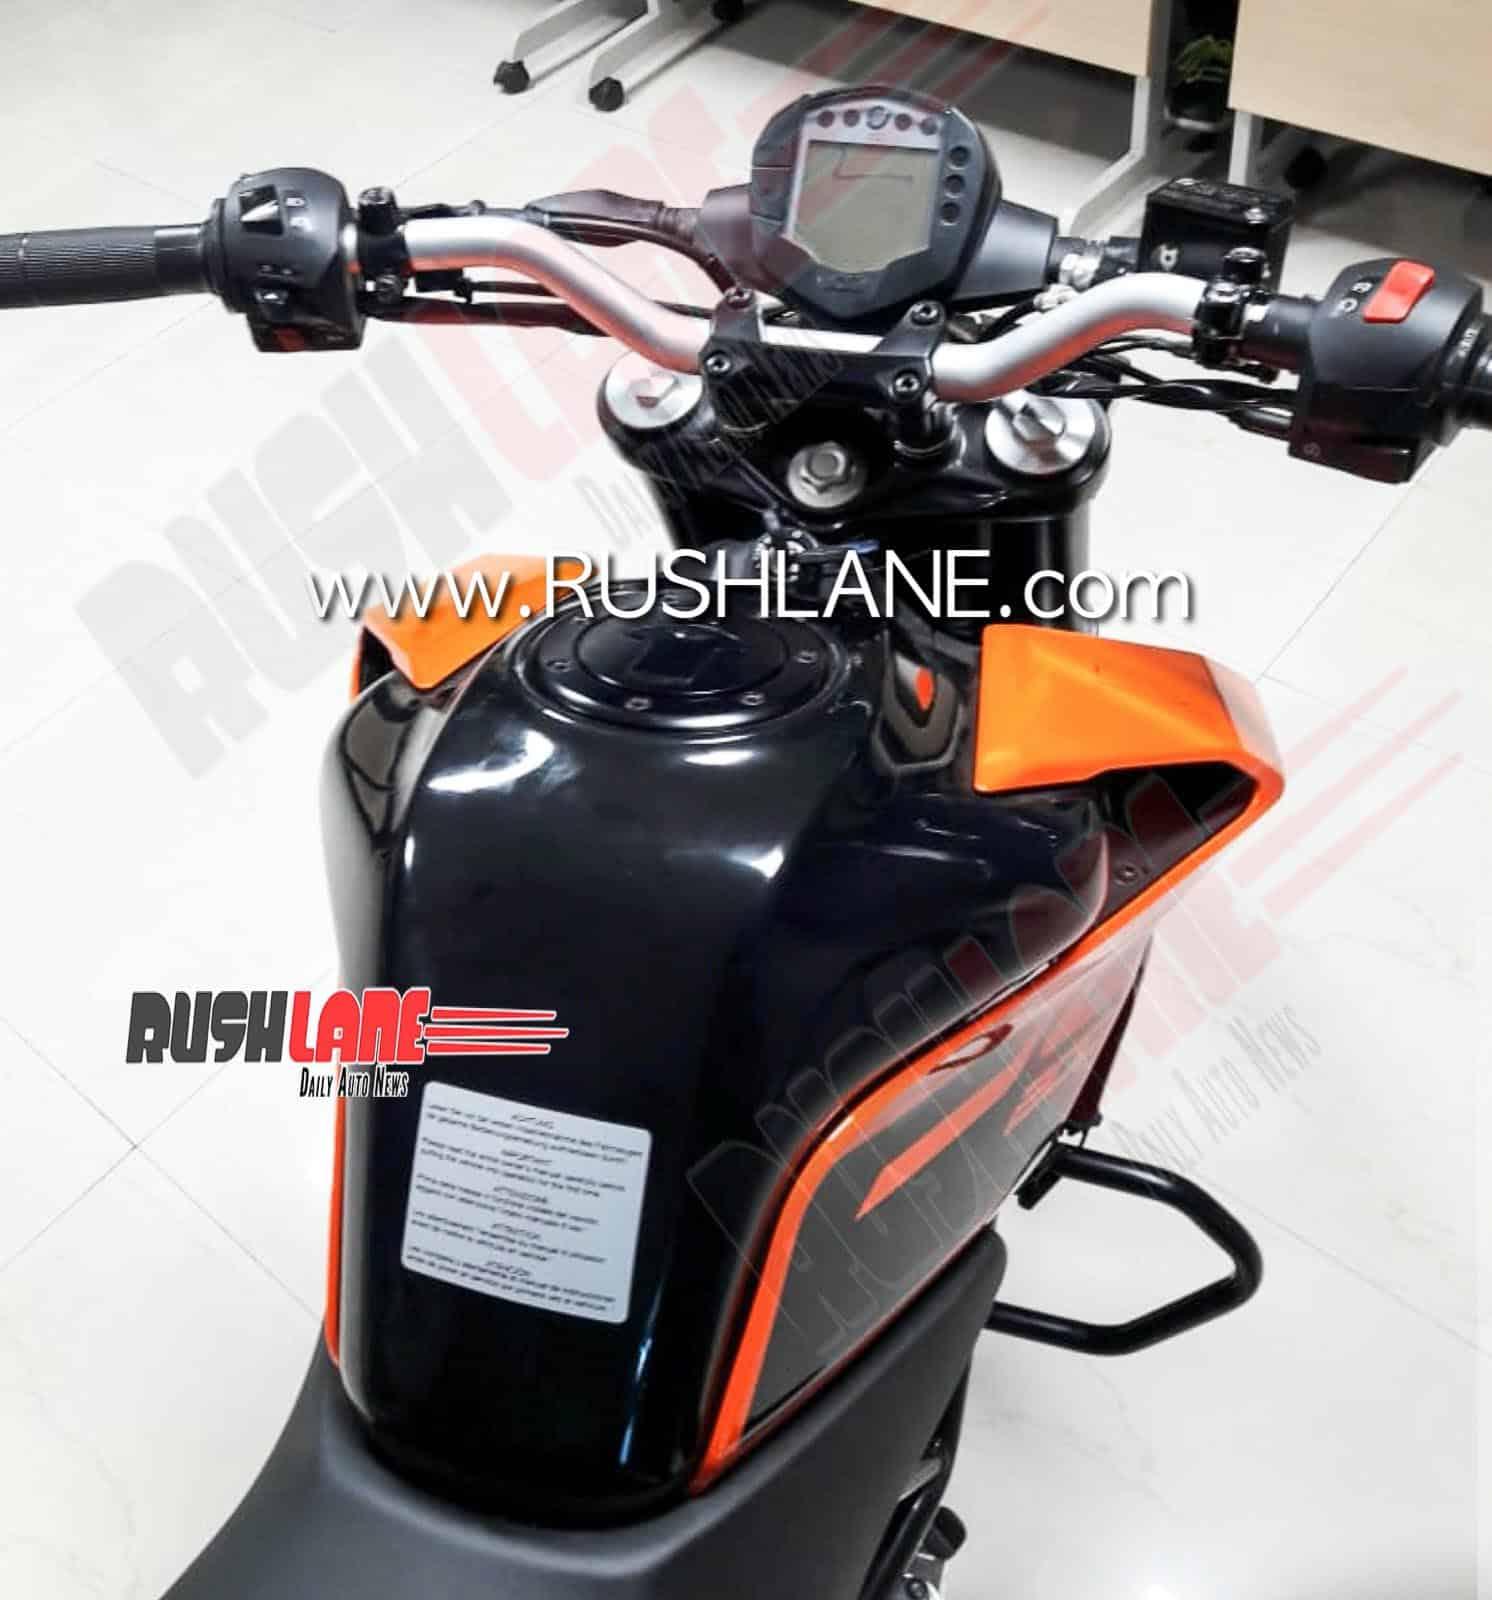 2020 Ktm Duke 200 Bs6 Gets All New Design Launch Soon